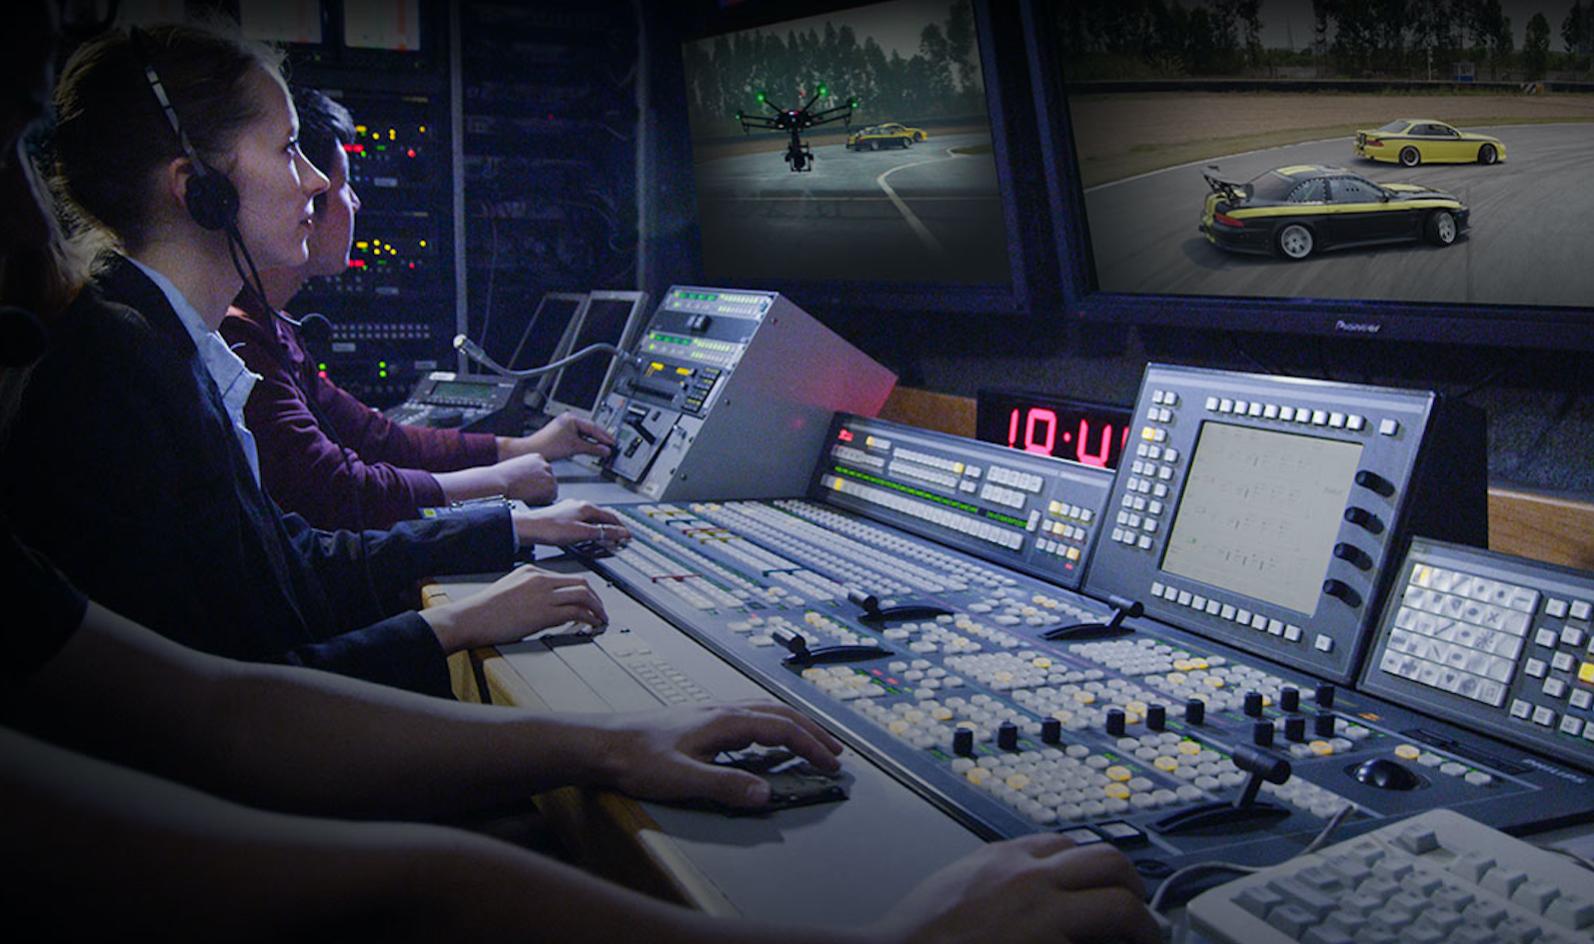 HD-Transmission